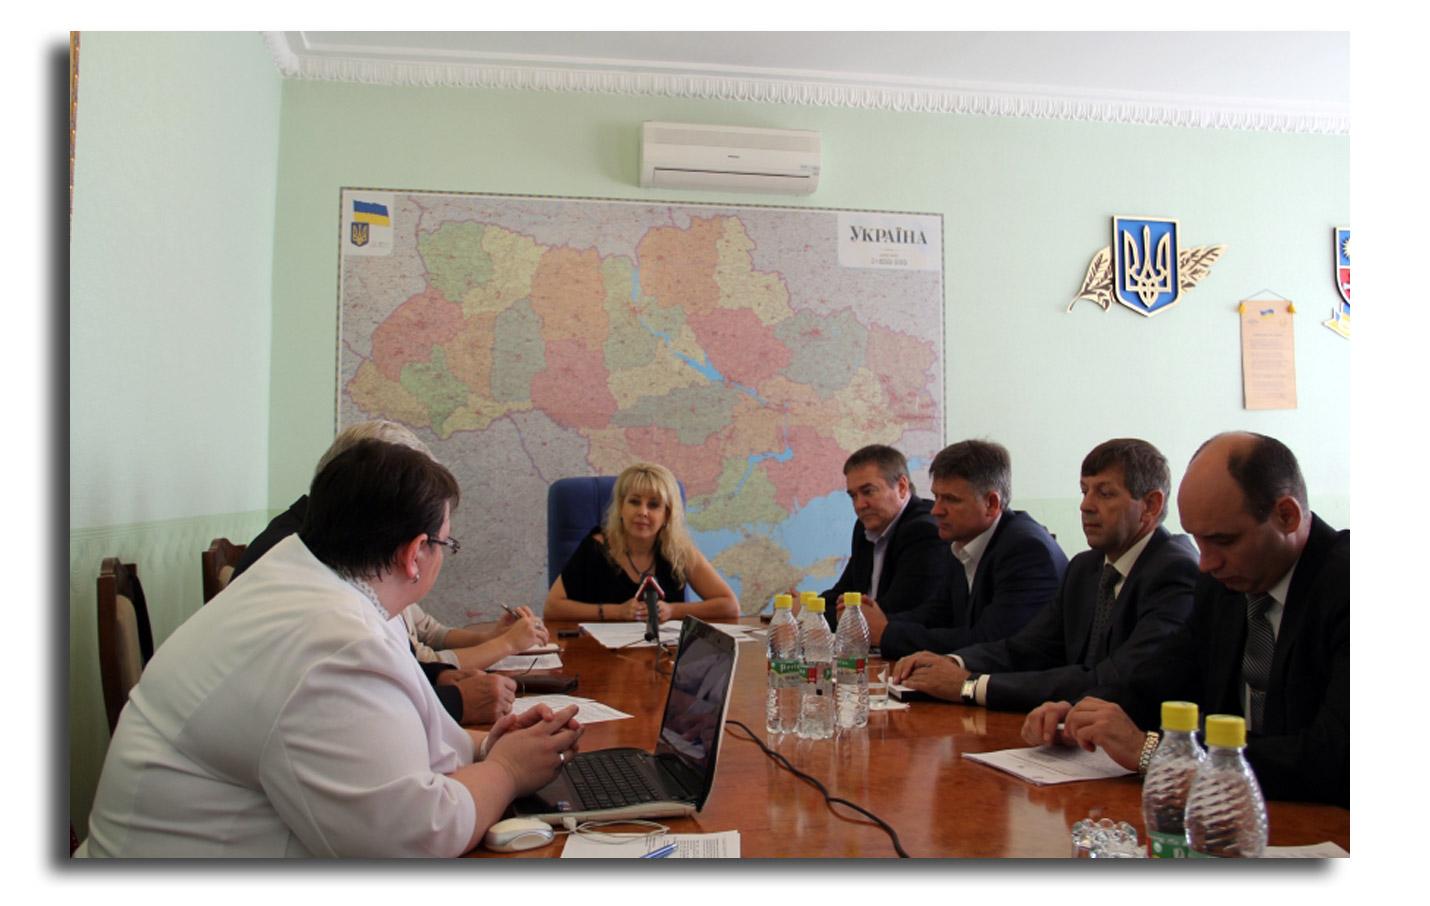 Zdjęcie pobrano z svobodaslova.in.ua